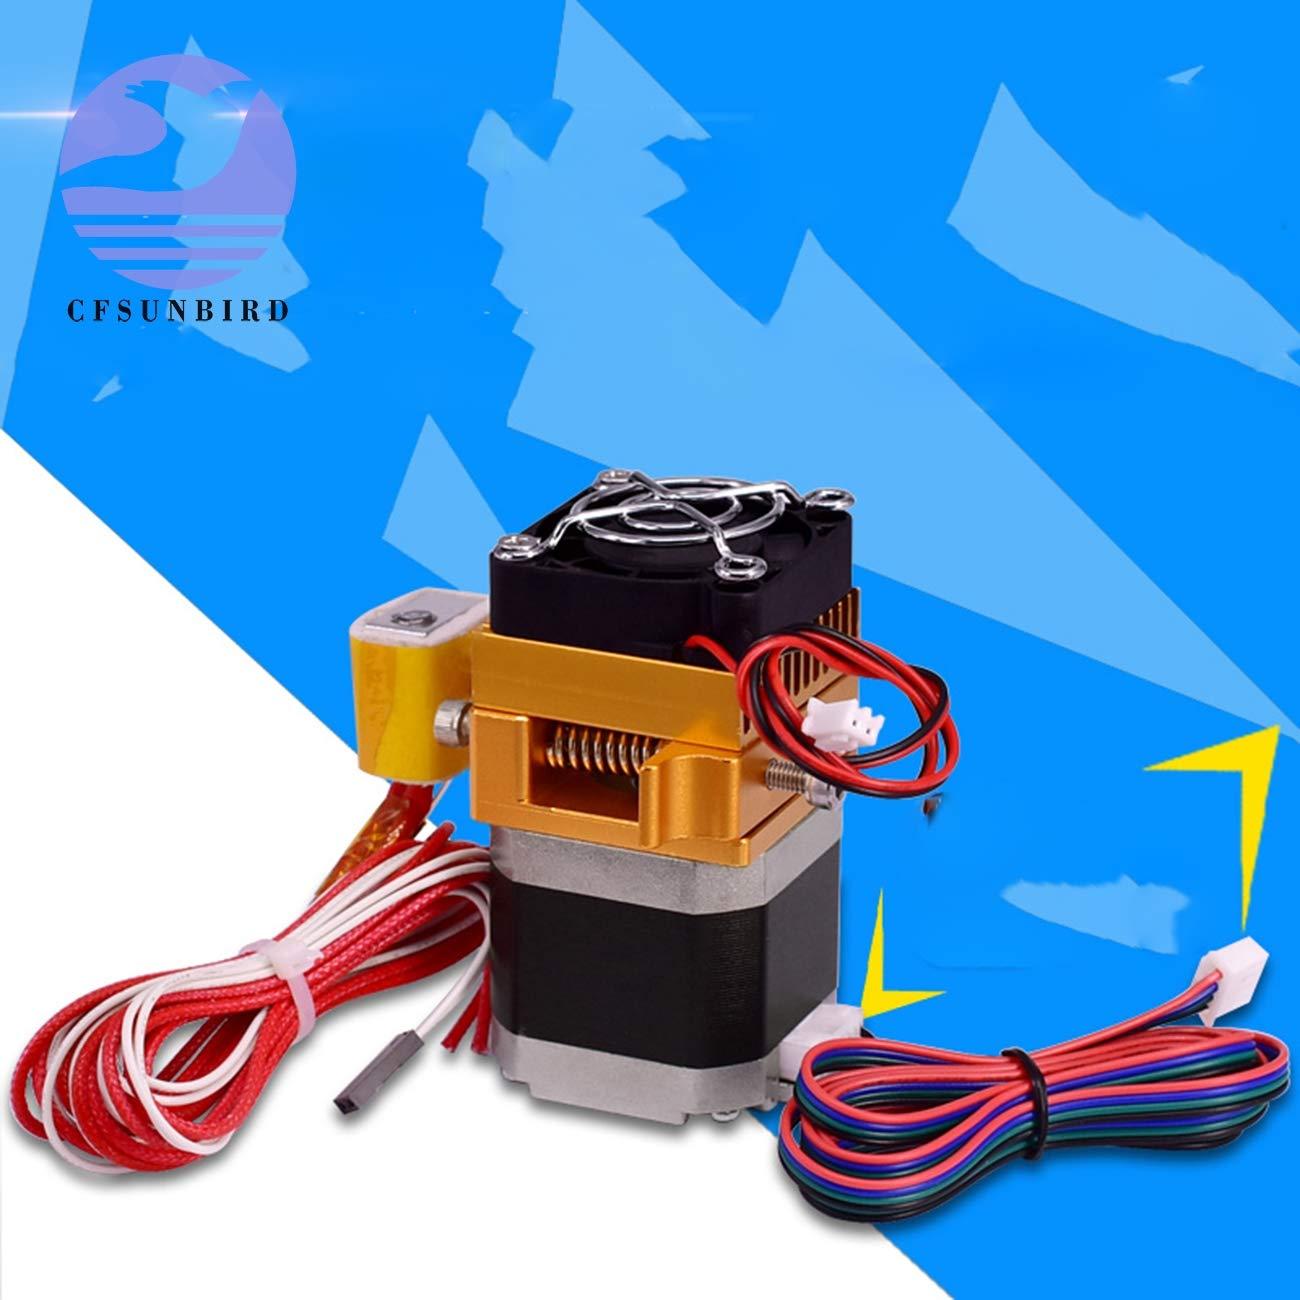 MK8 Extruder Head J-Head Hotend 0.4mm Nozzle Kit 1.75mm Filament Extrusion 3D Printers Parts with Box Motor Throat Aluminum Part